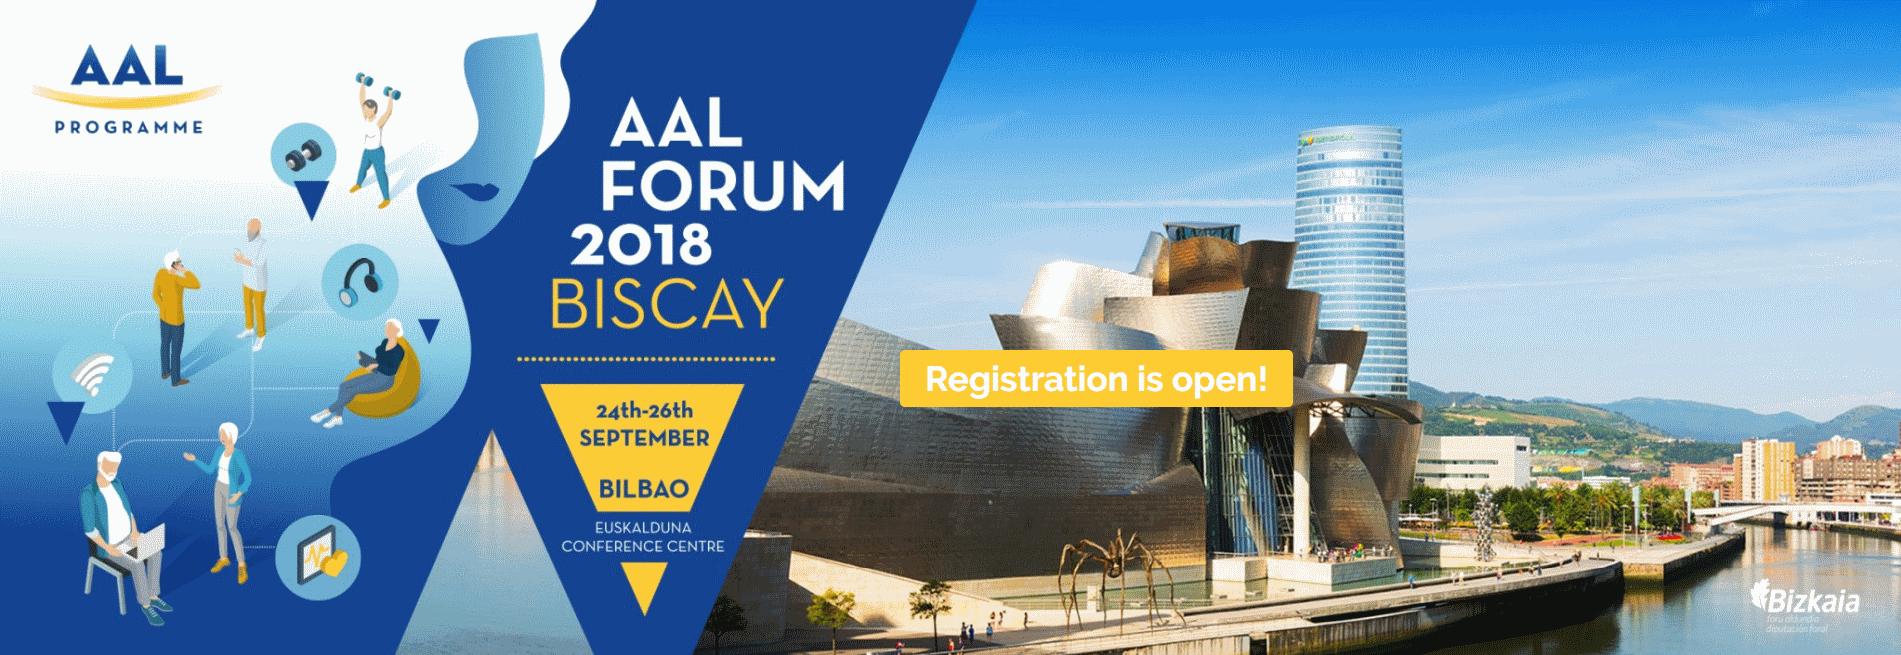 AAL Forum Bilbao Ideable